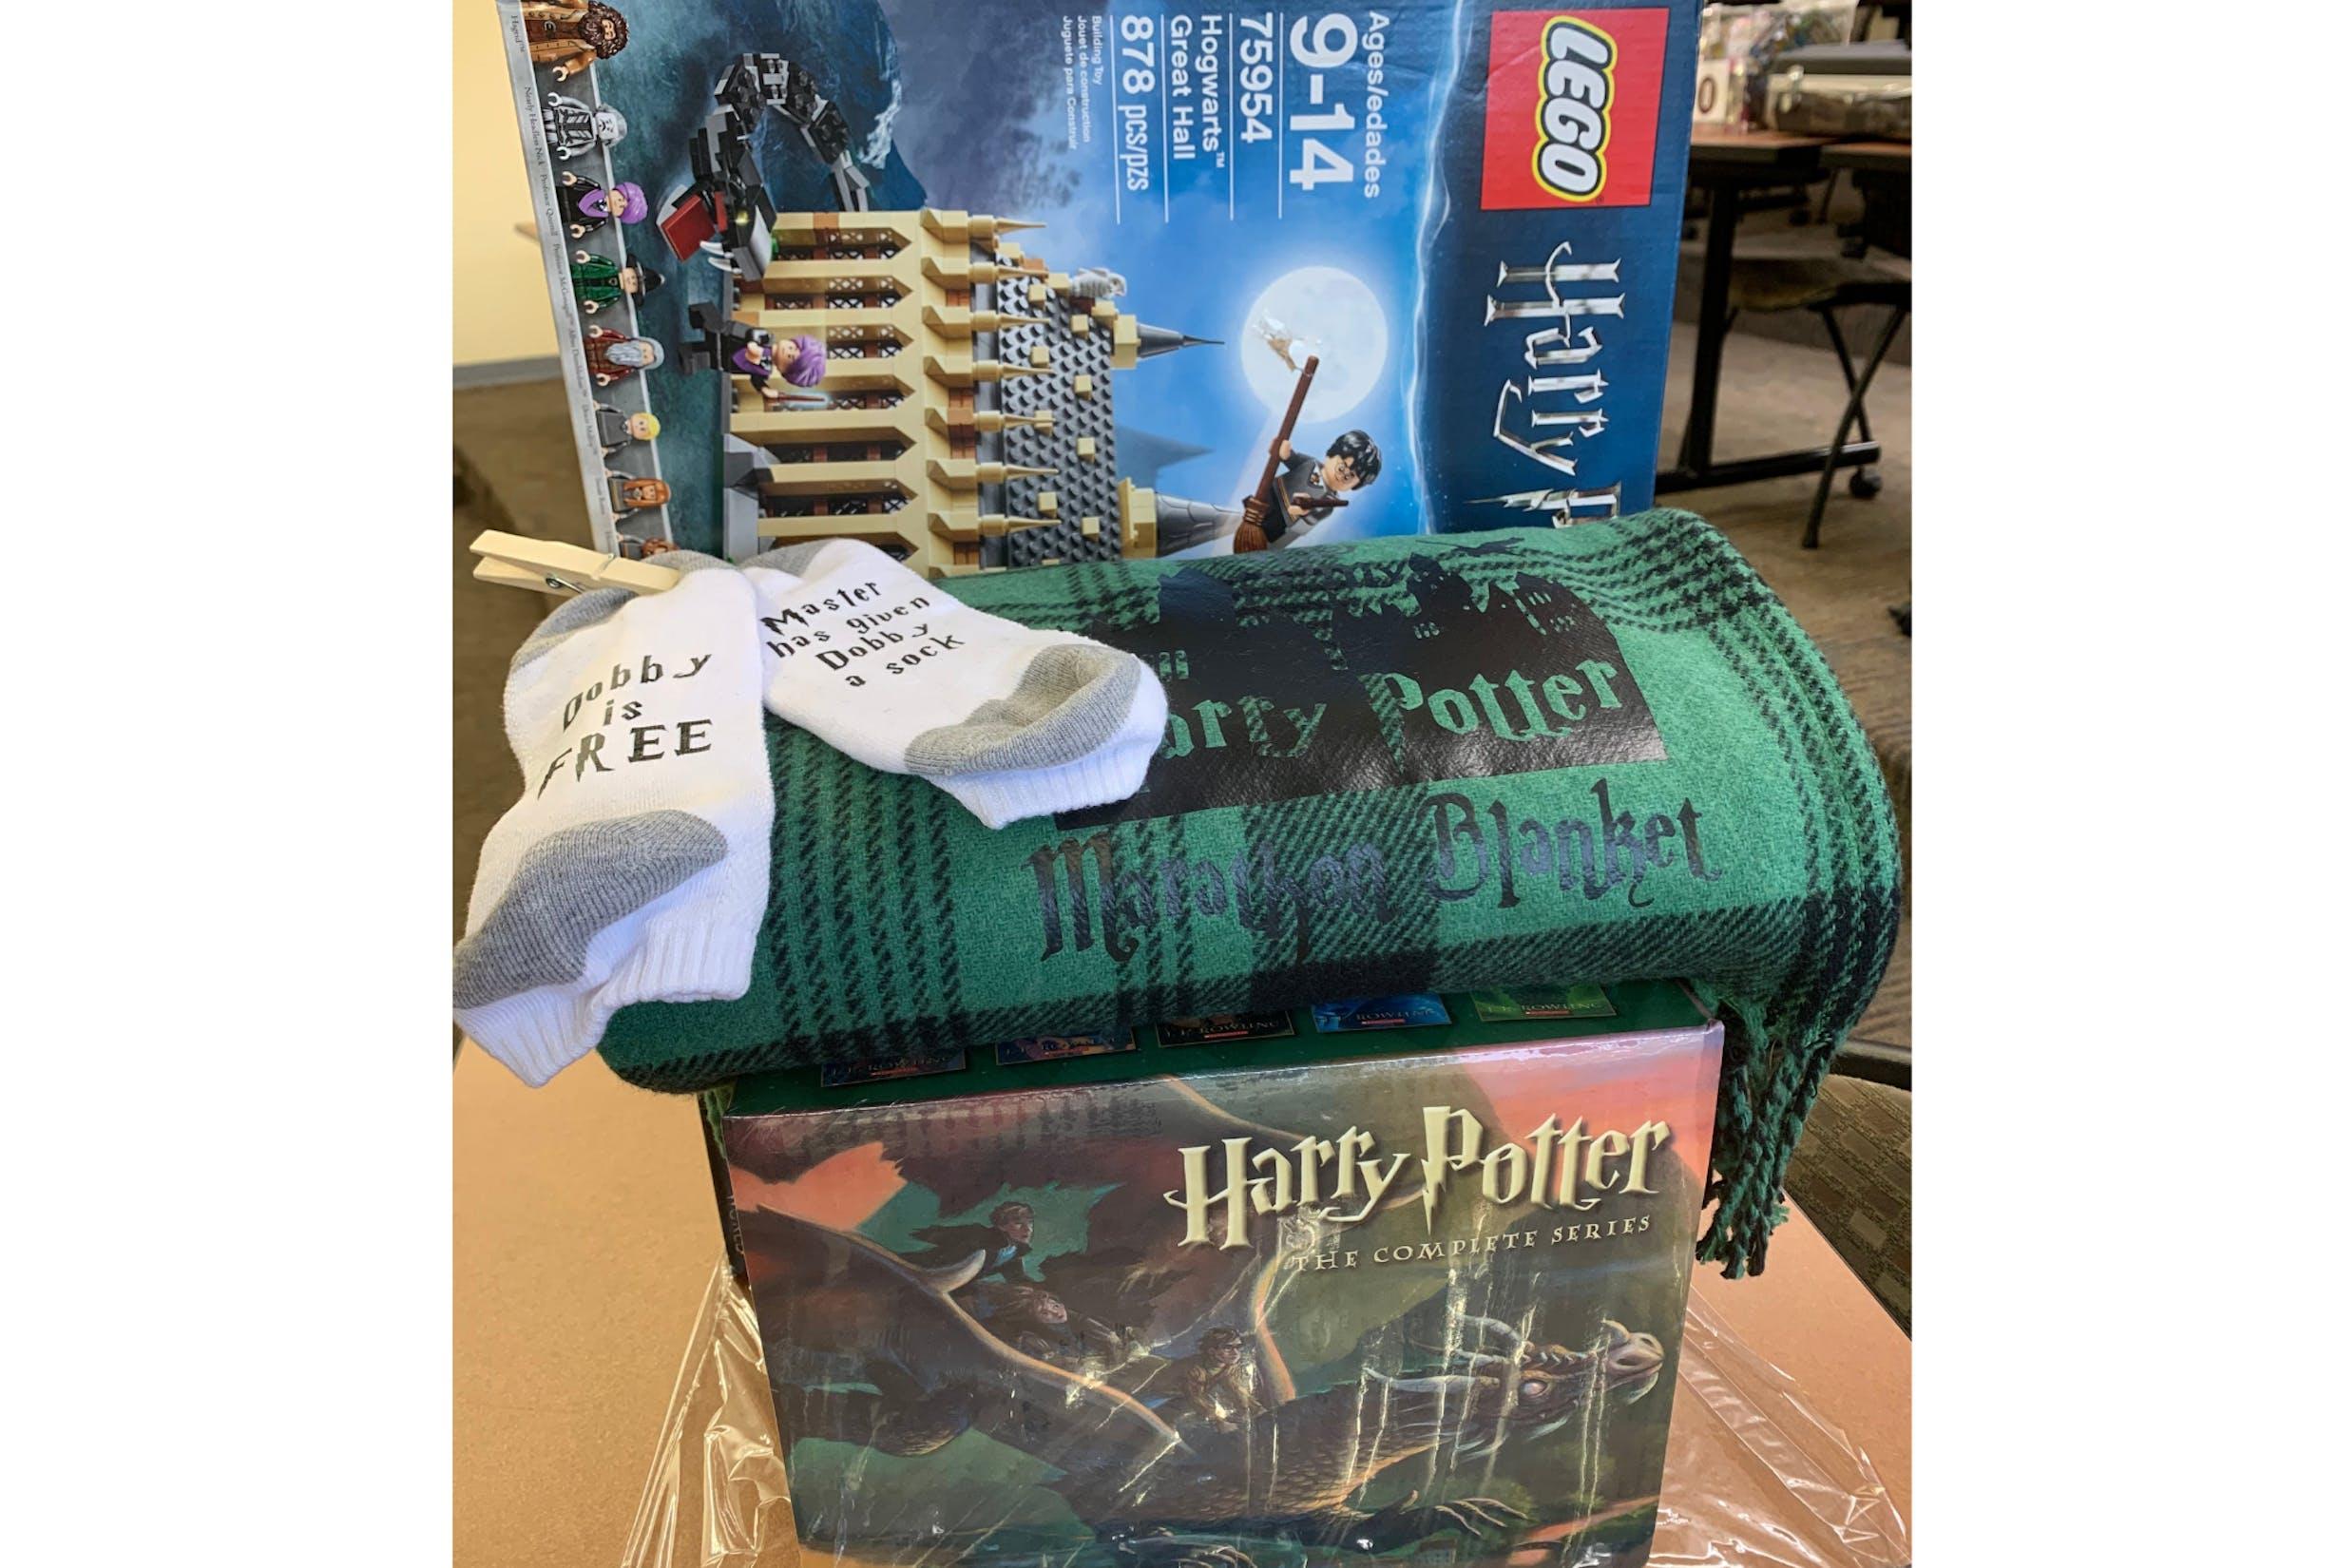 Harry Potter Fun Prize